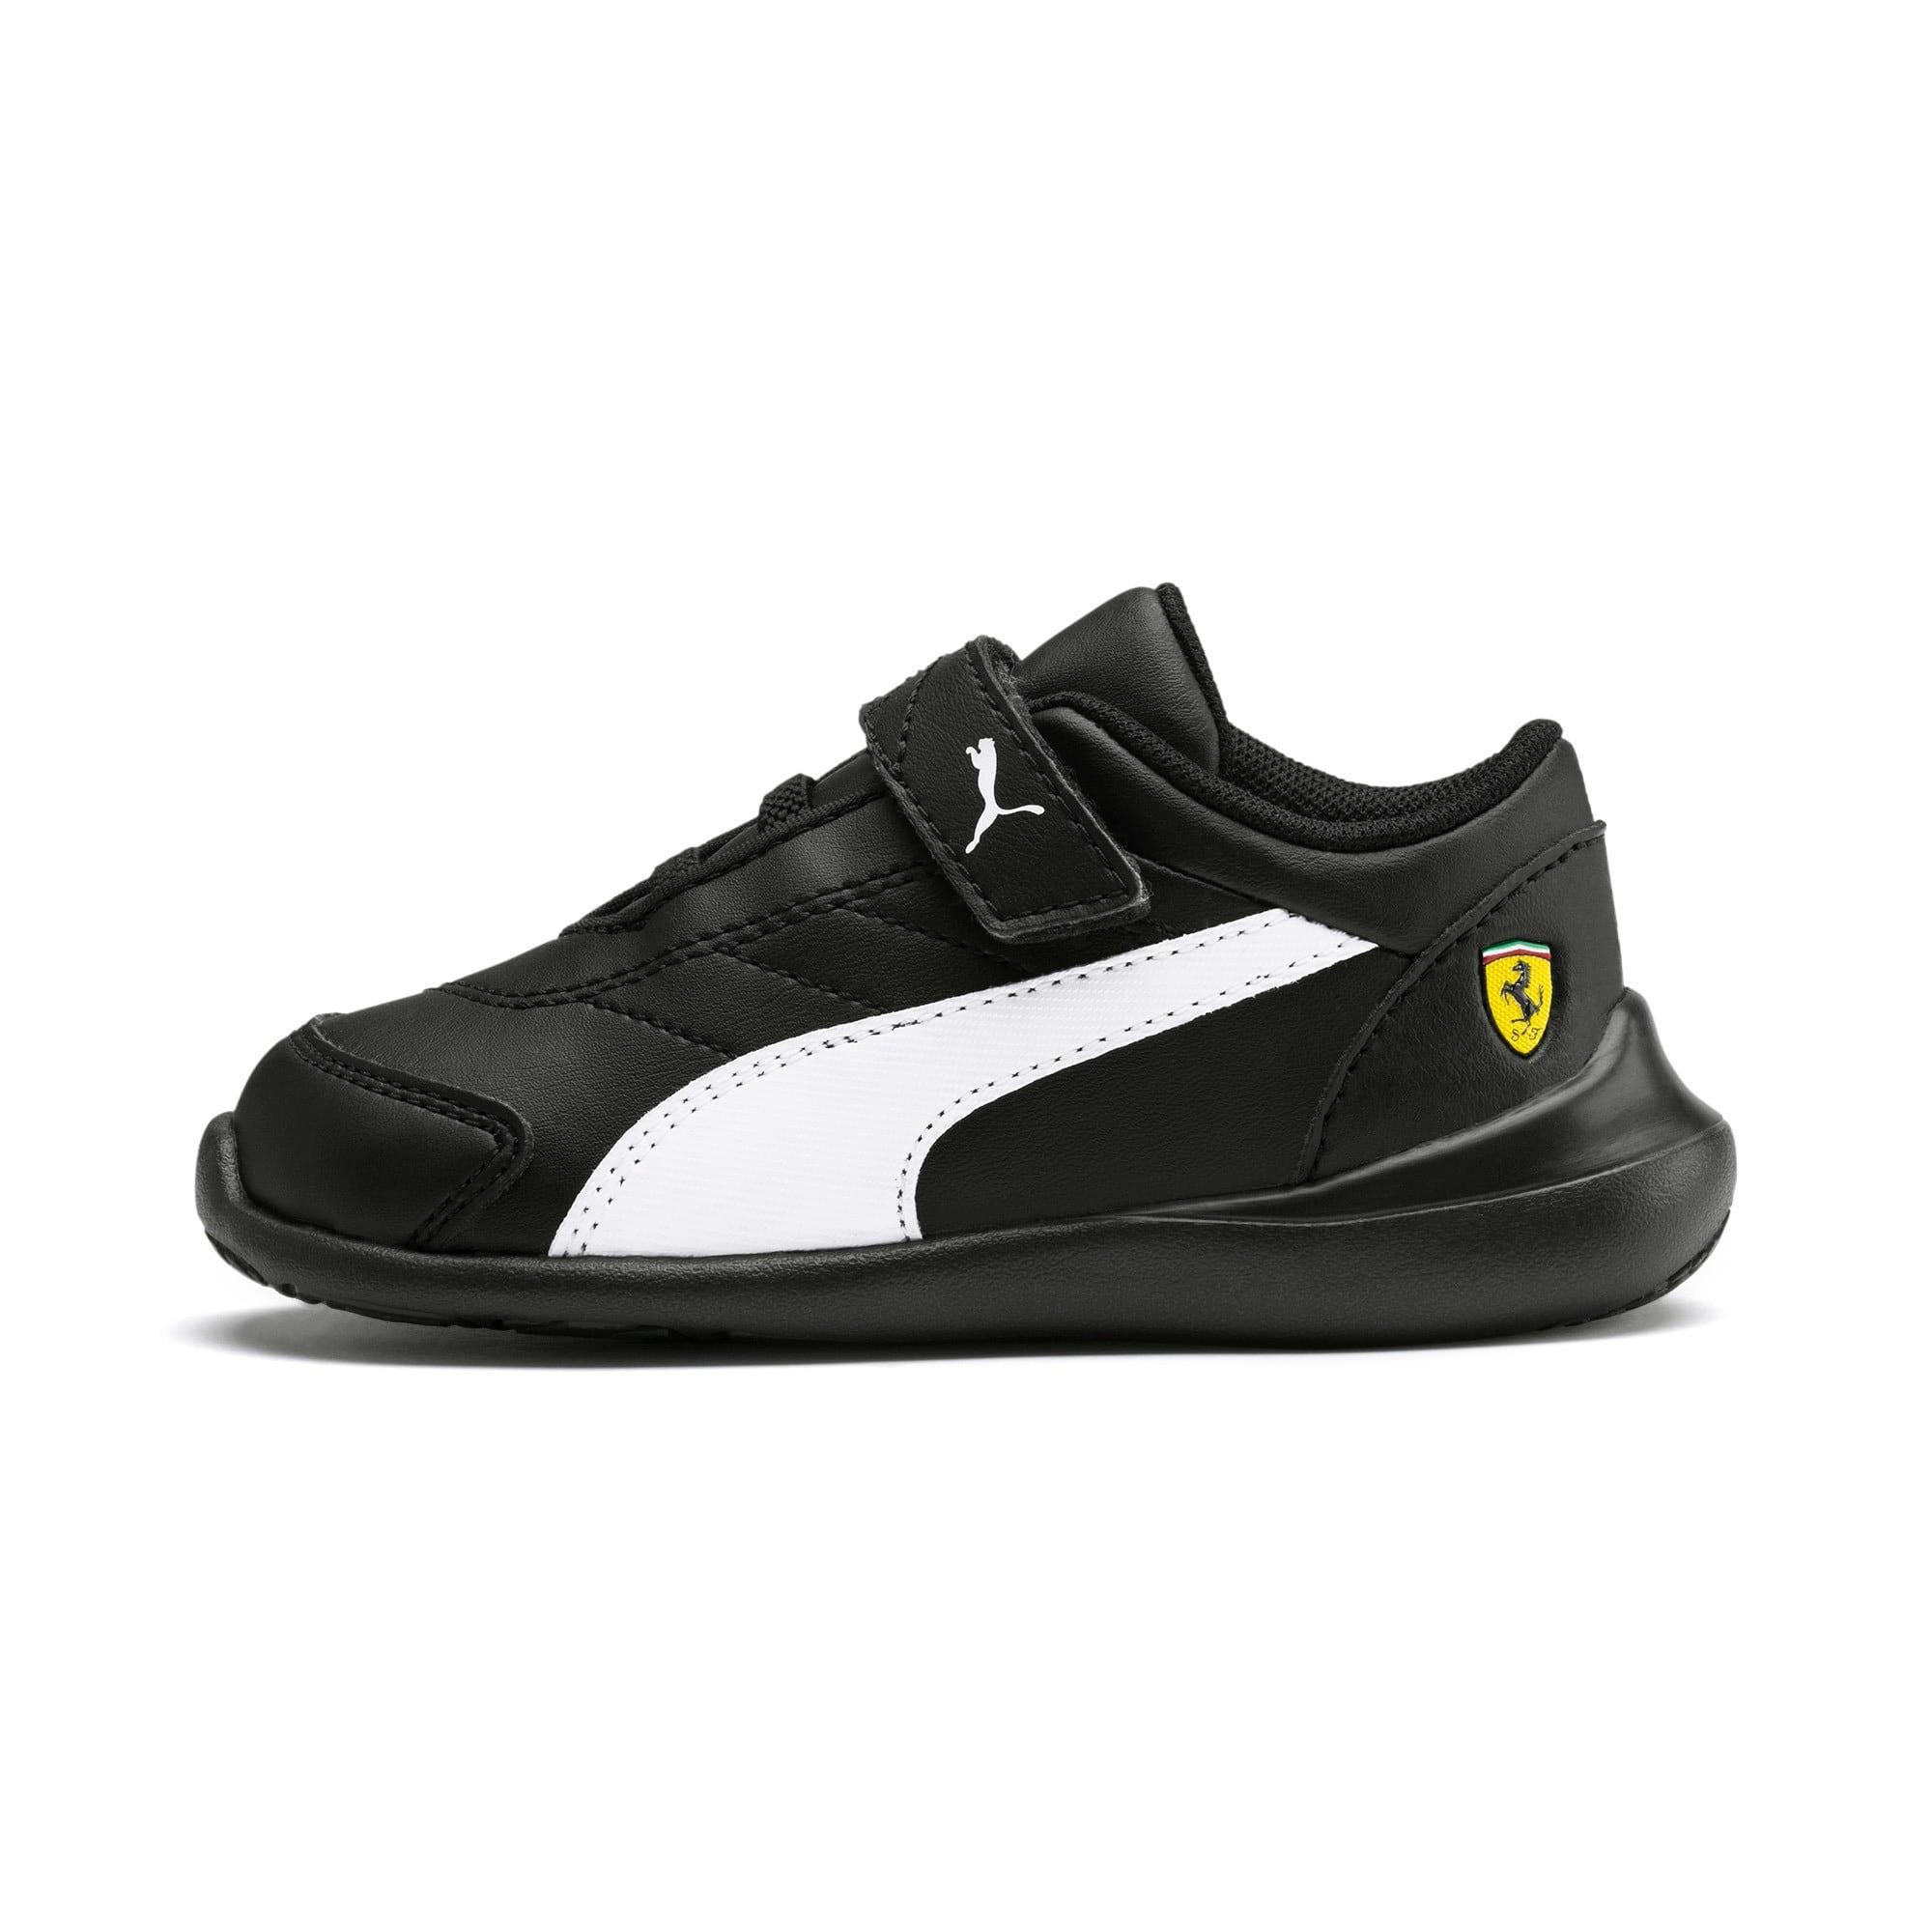 Thumbnail 1 of Scuderia Ferrari Kart Cat III Toddler Shoes, Black-White-Blazing Yellow, medium